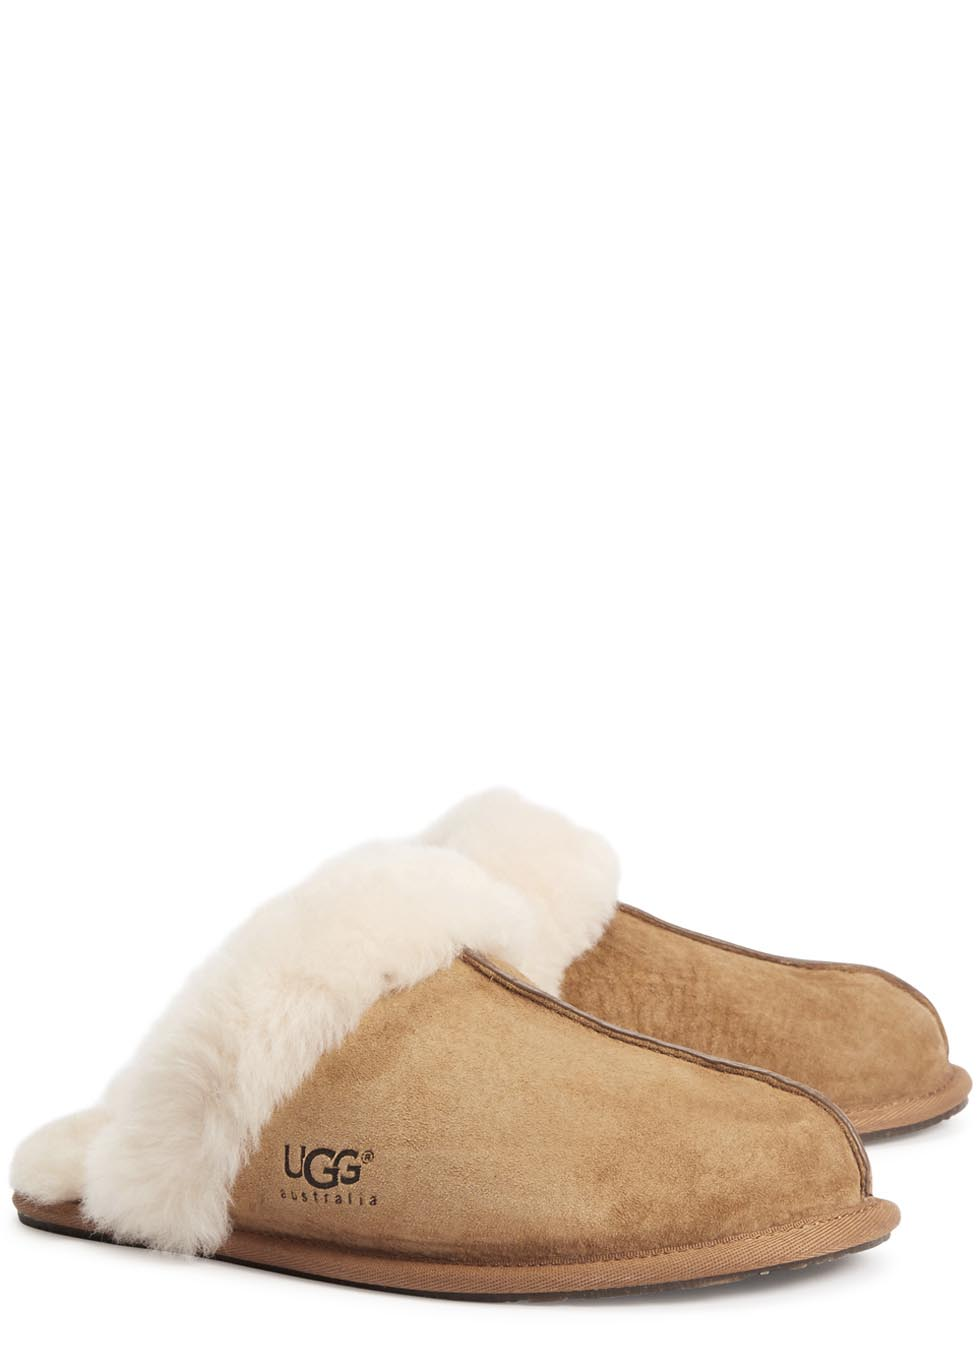 Scuffette II chestnut suede slippers - UGG